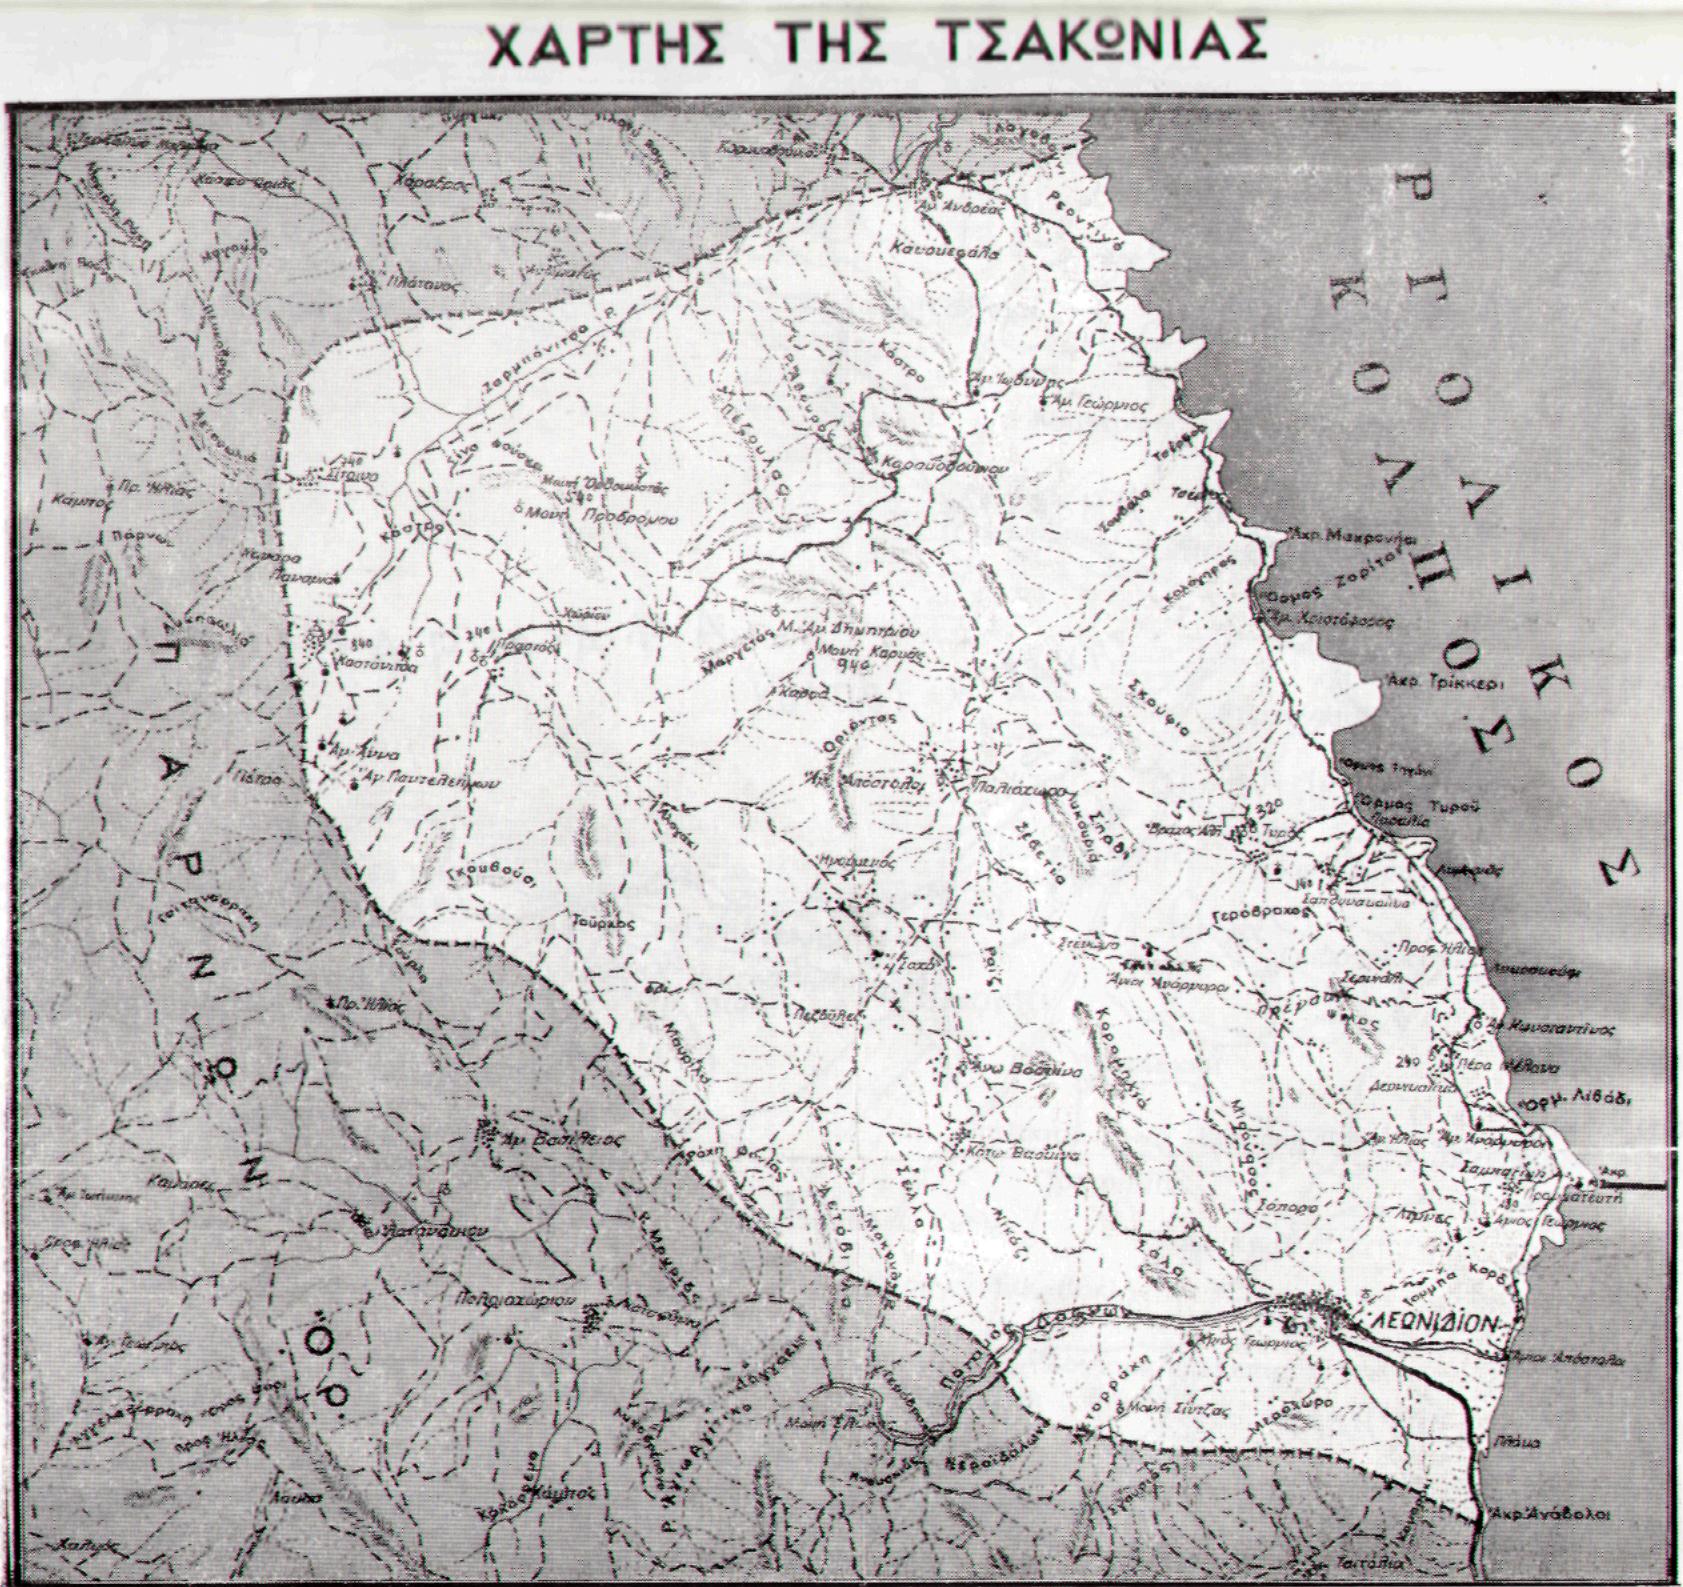 http://www.greek-language.gr/greekLang/images/modern_greek/guides/dialects/tsakonian_map.jpg